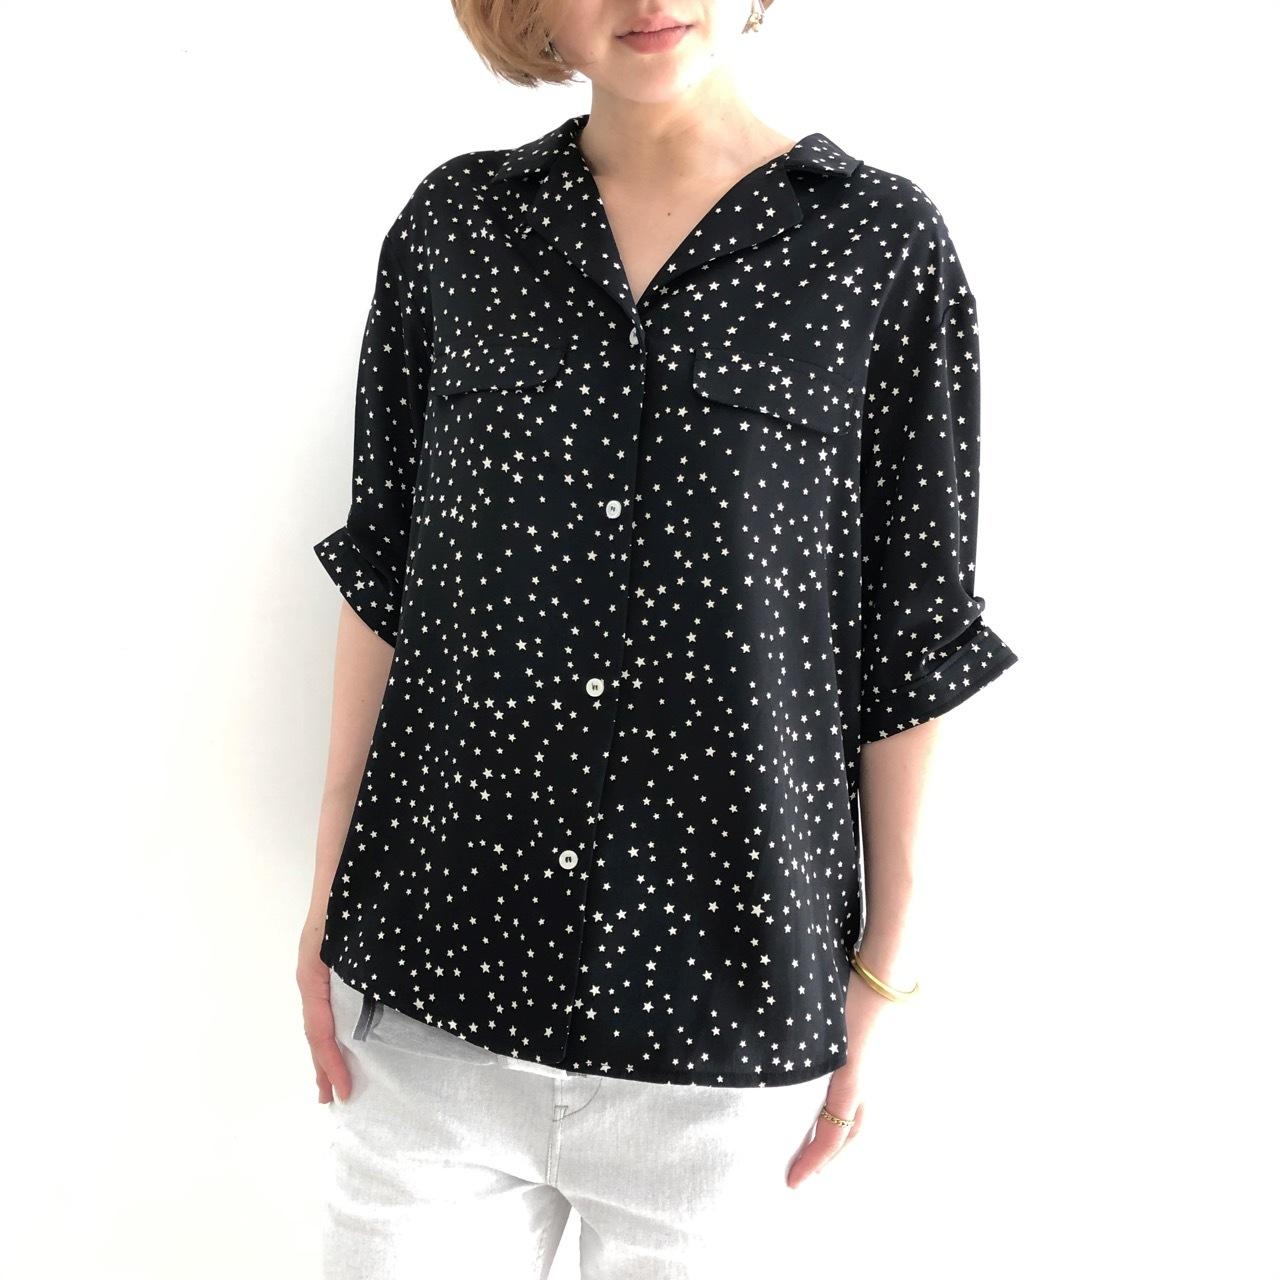 【 CYNICAL 】- 912-95121 - スターオープンカラーシャツ